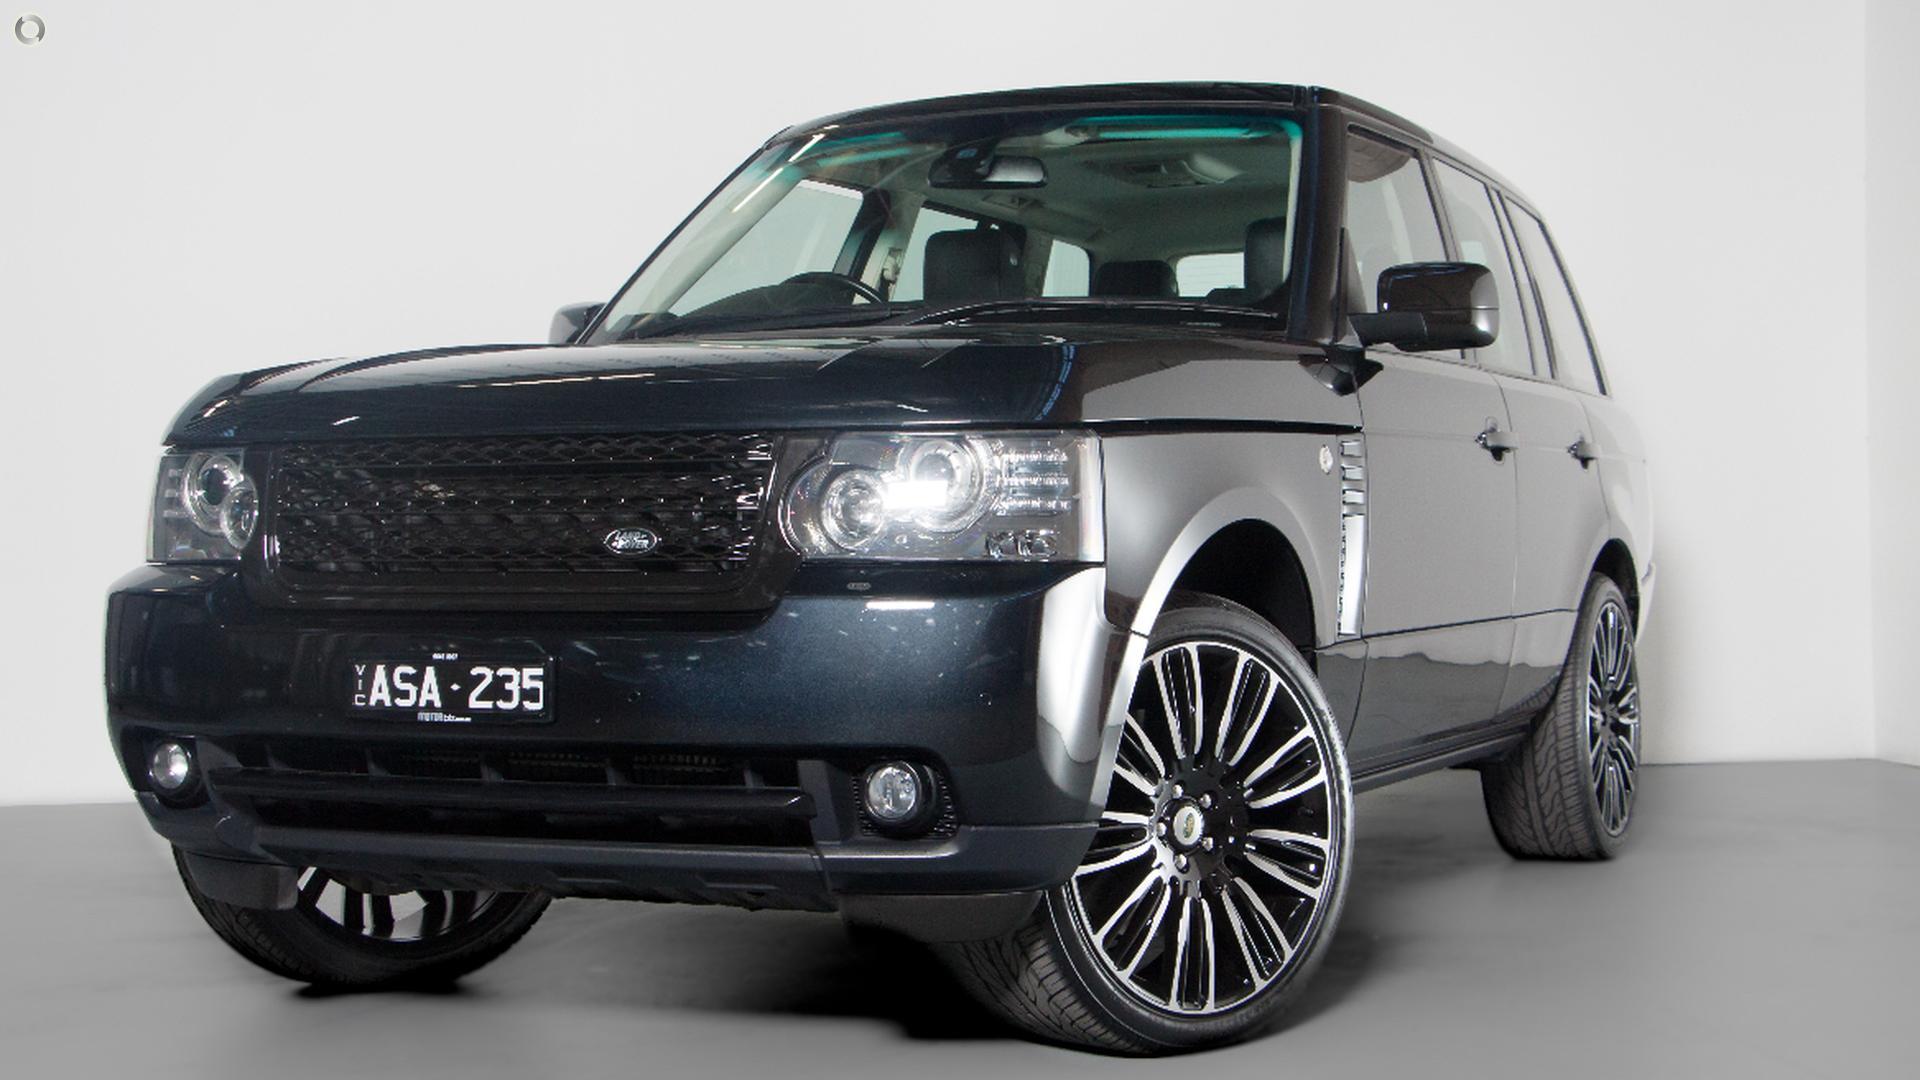 2011 Land Rover Range Rover Vogue TDV8 L322